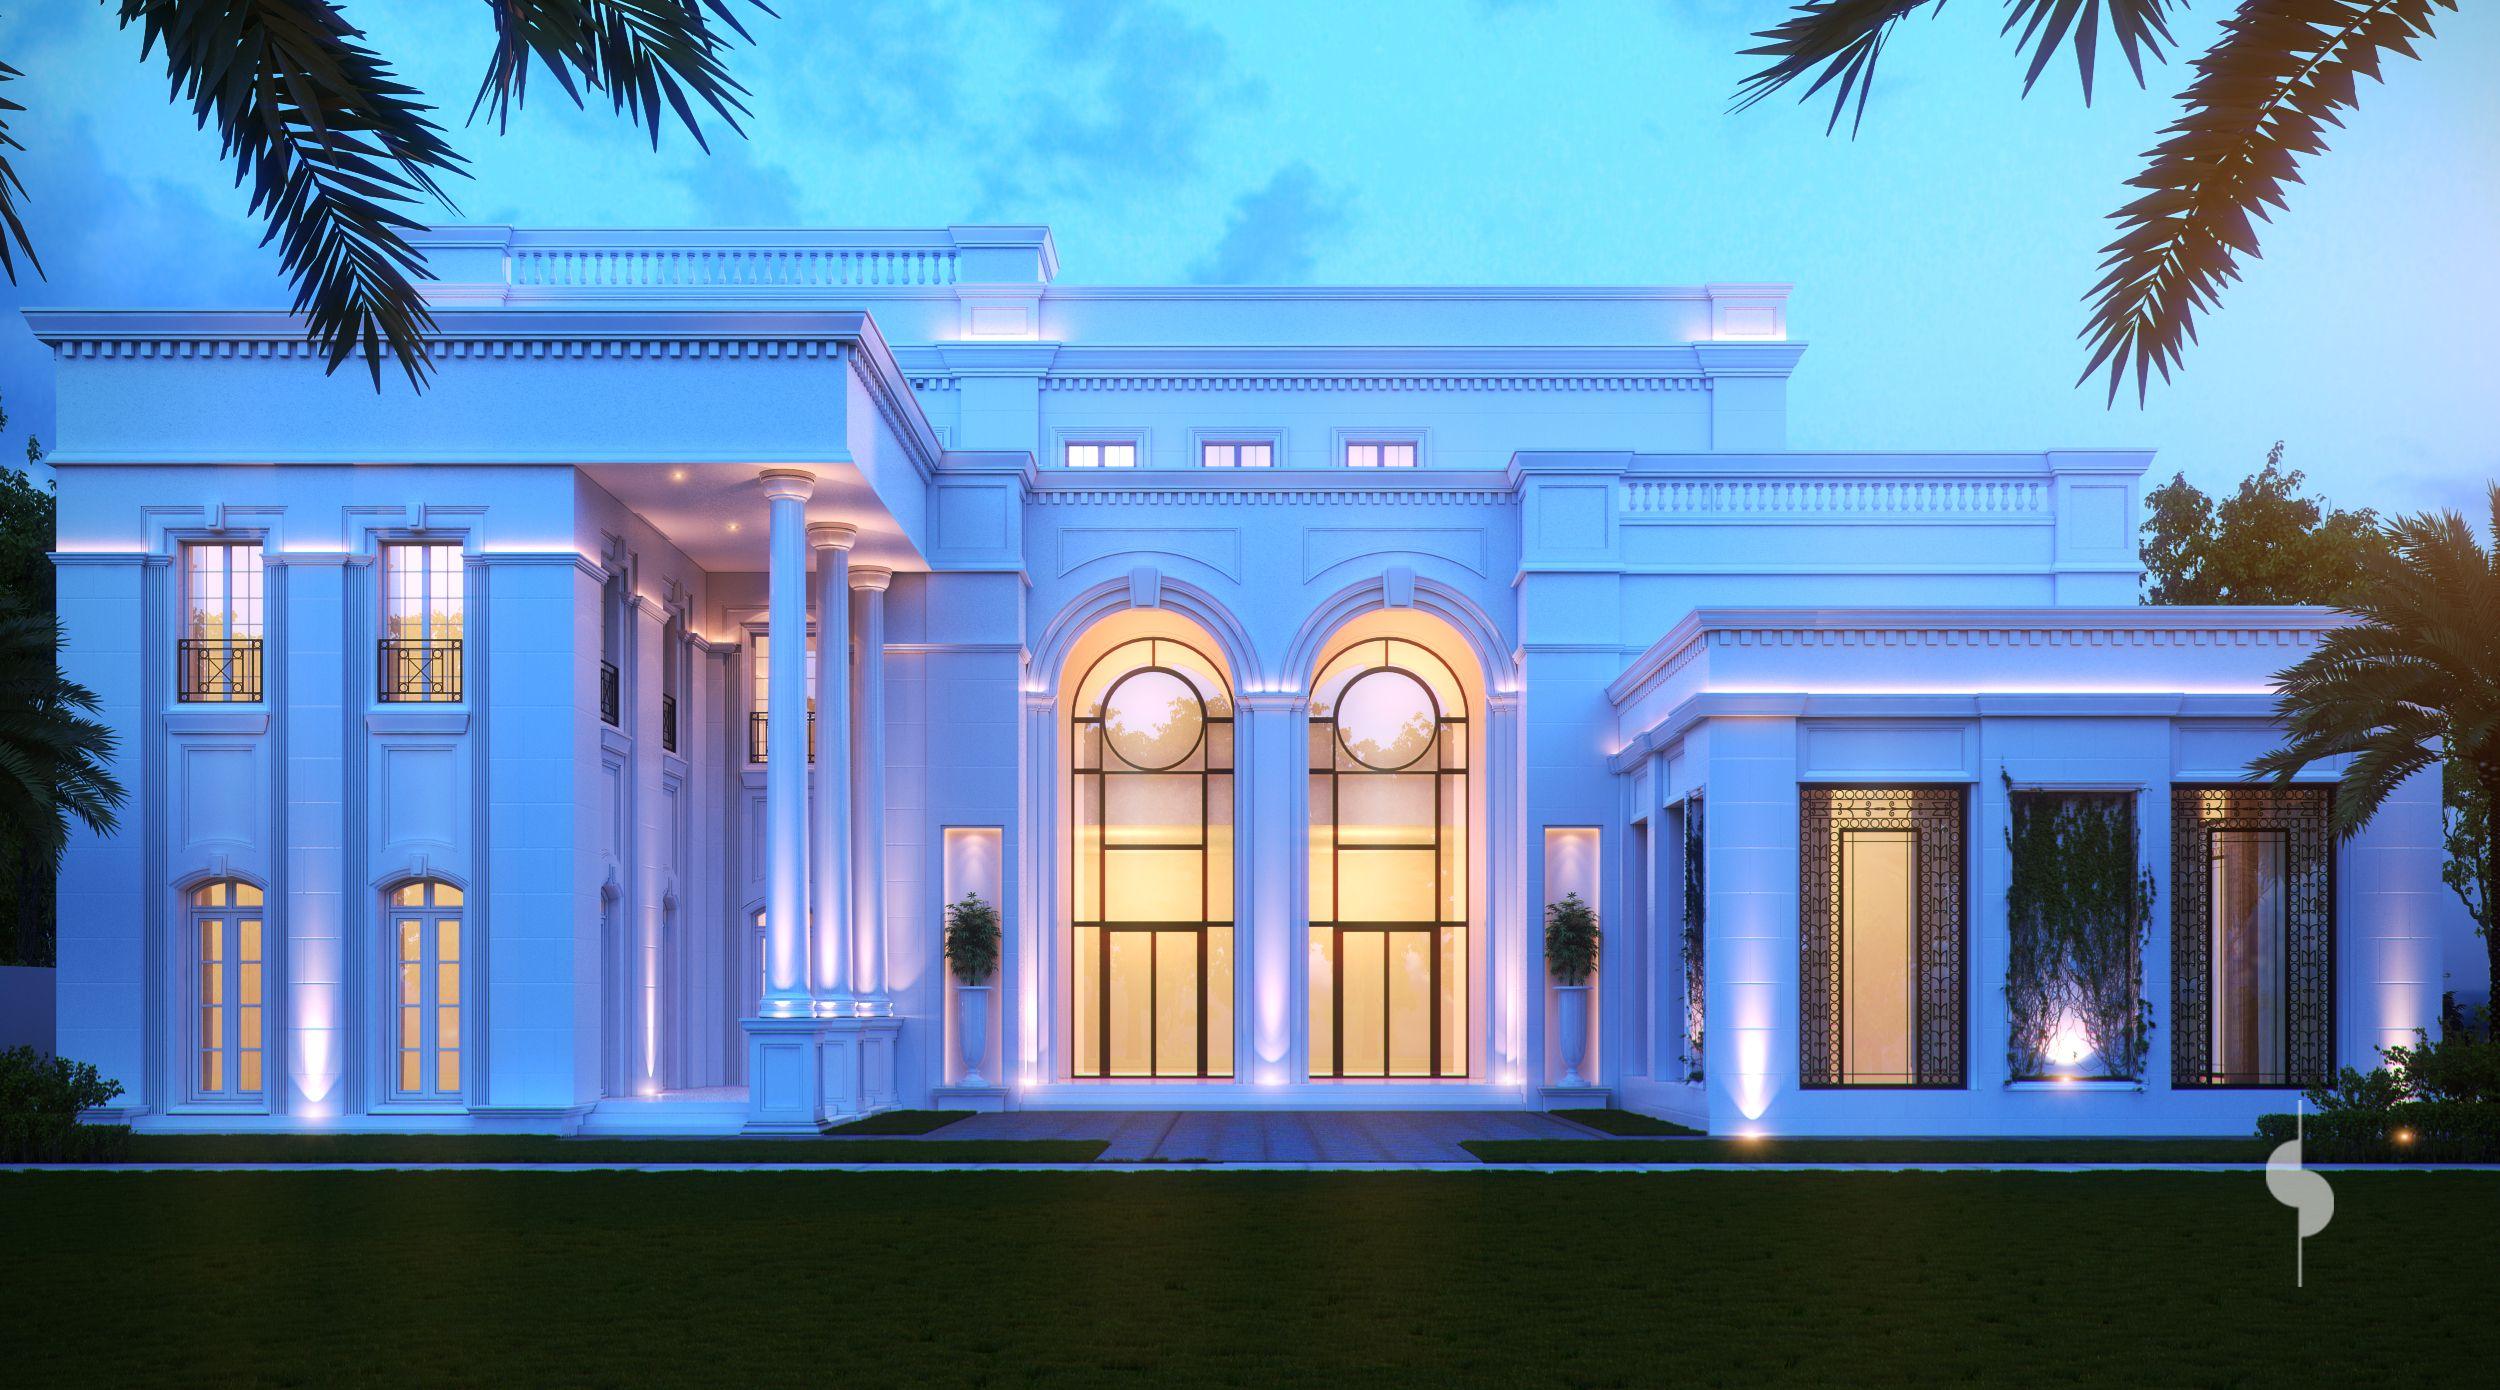 2000m private villa ksa sarah sadeq architects sarah sadeq architectes pinterest villas. Black Bedroom Furniture Sets. Home Design Ideas